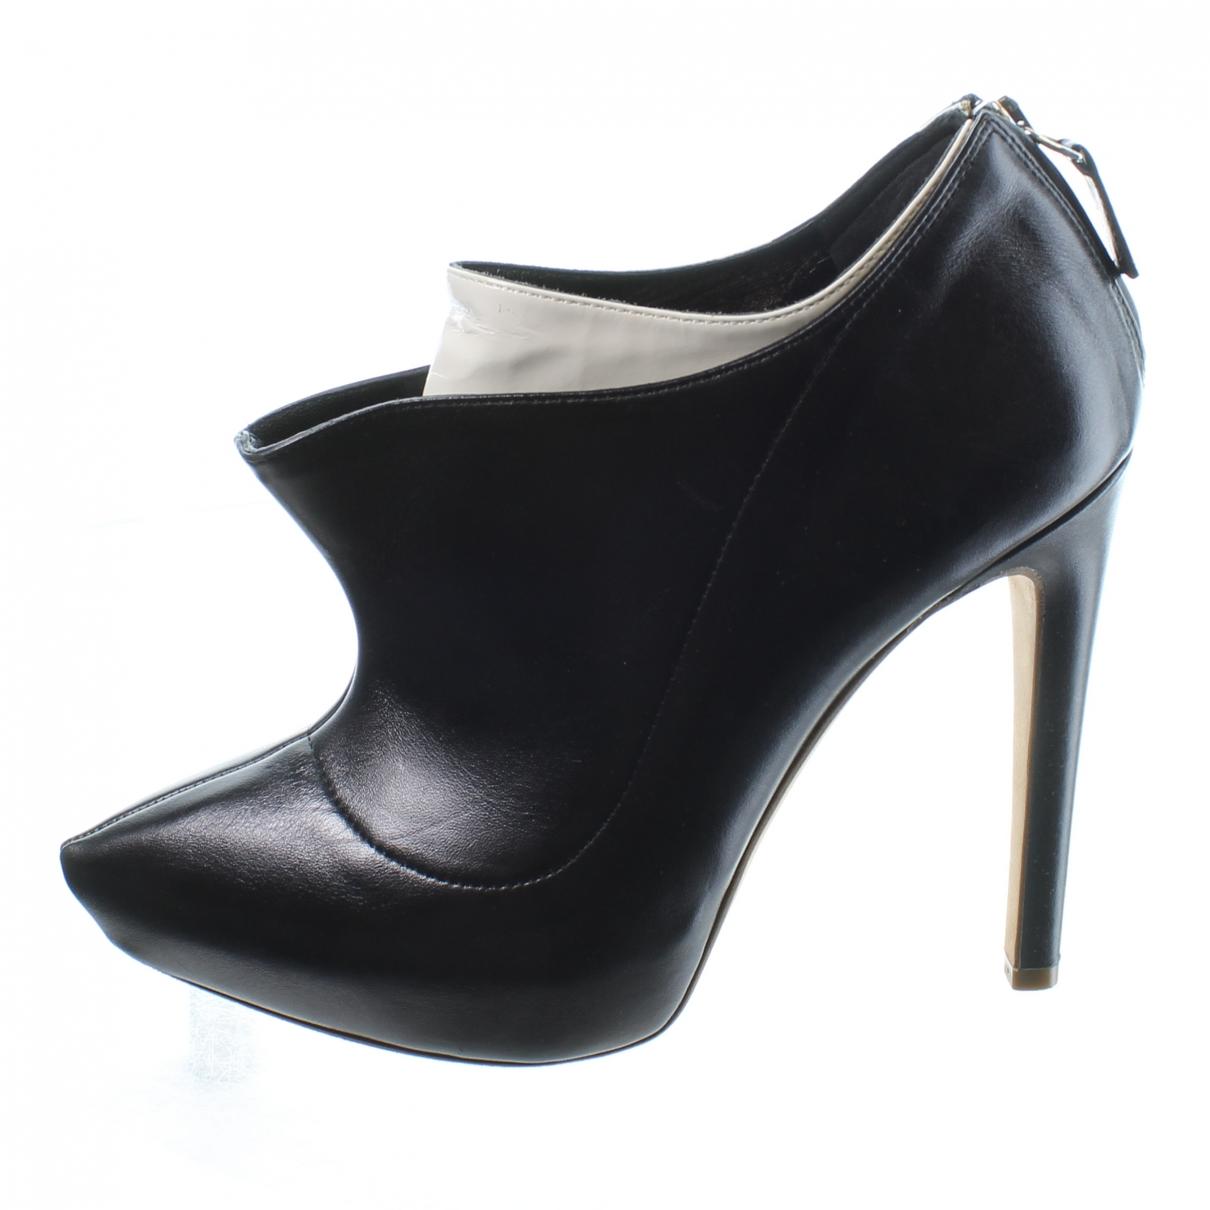 Rupert Sanderson \N Black Leather Ankle boots for Women 35.5 EU